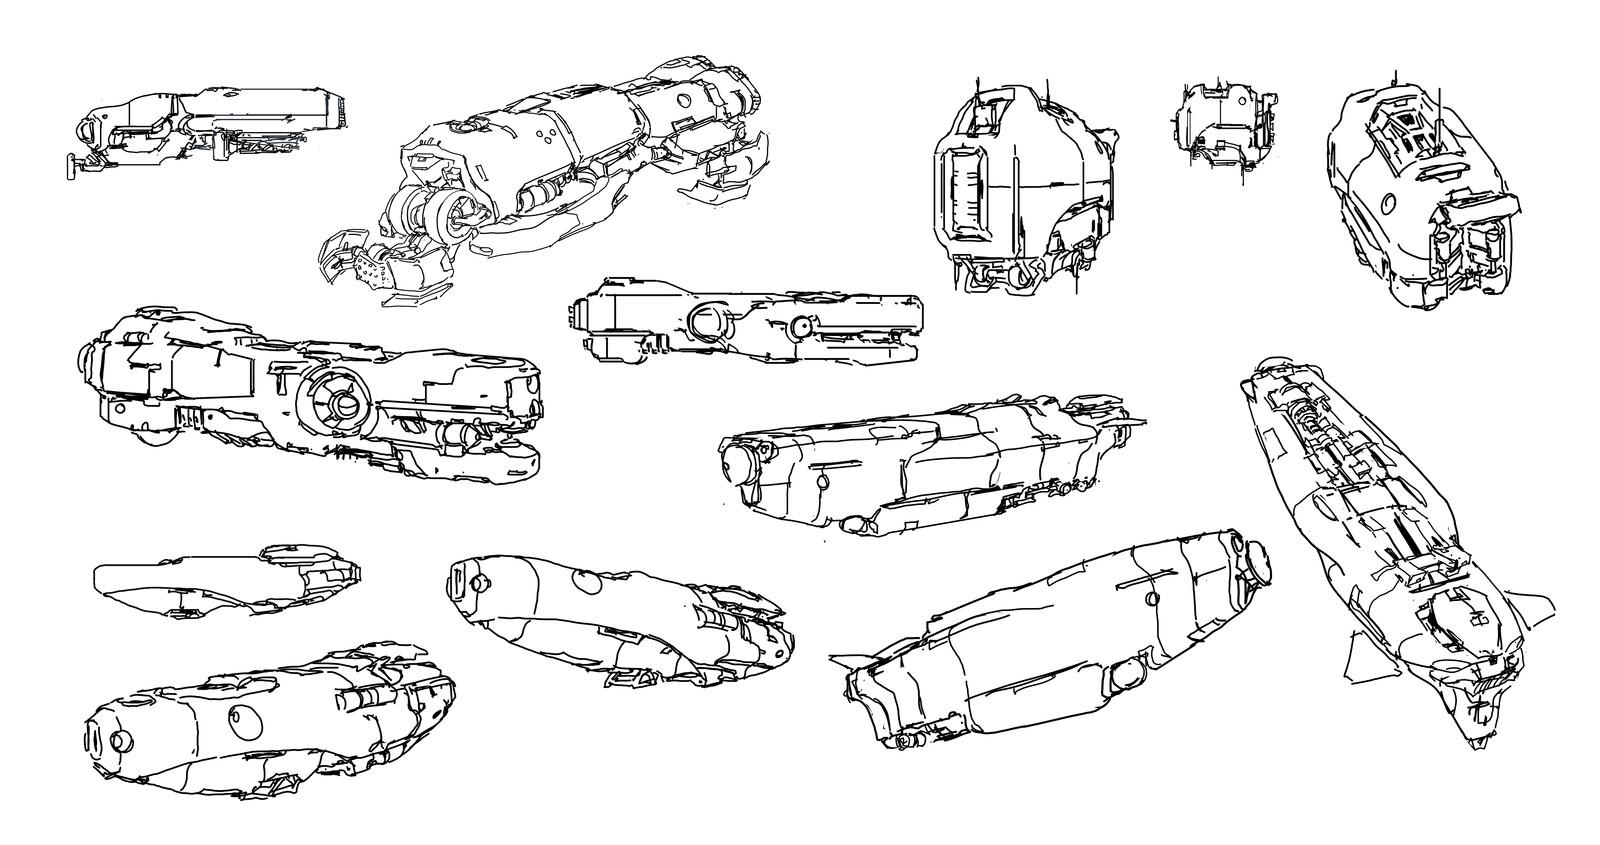 random ship doodle 5